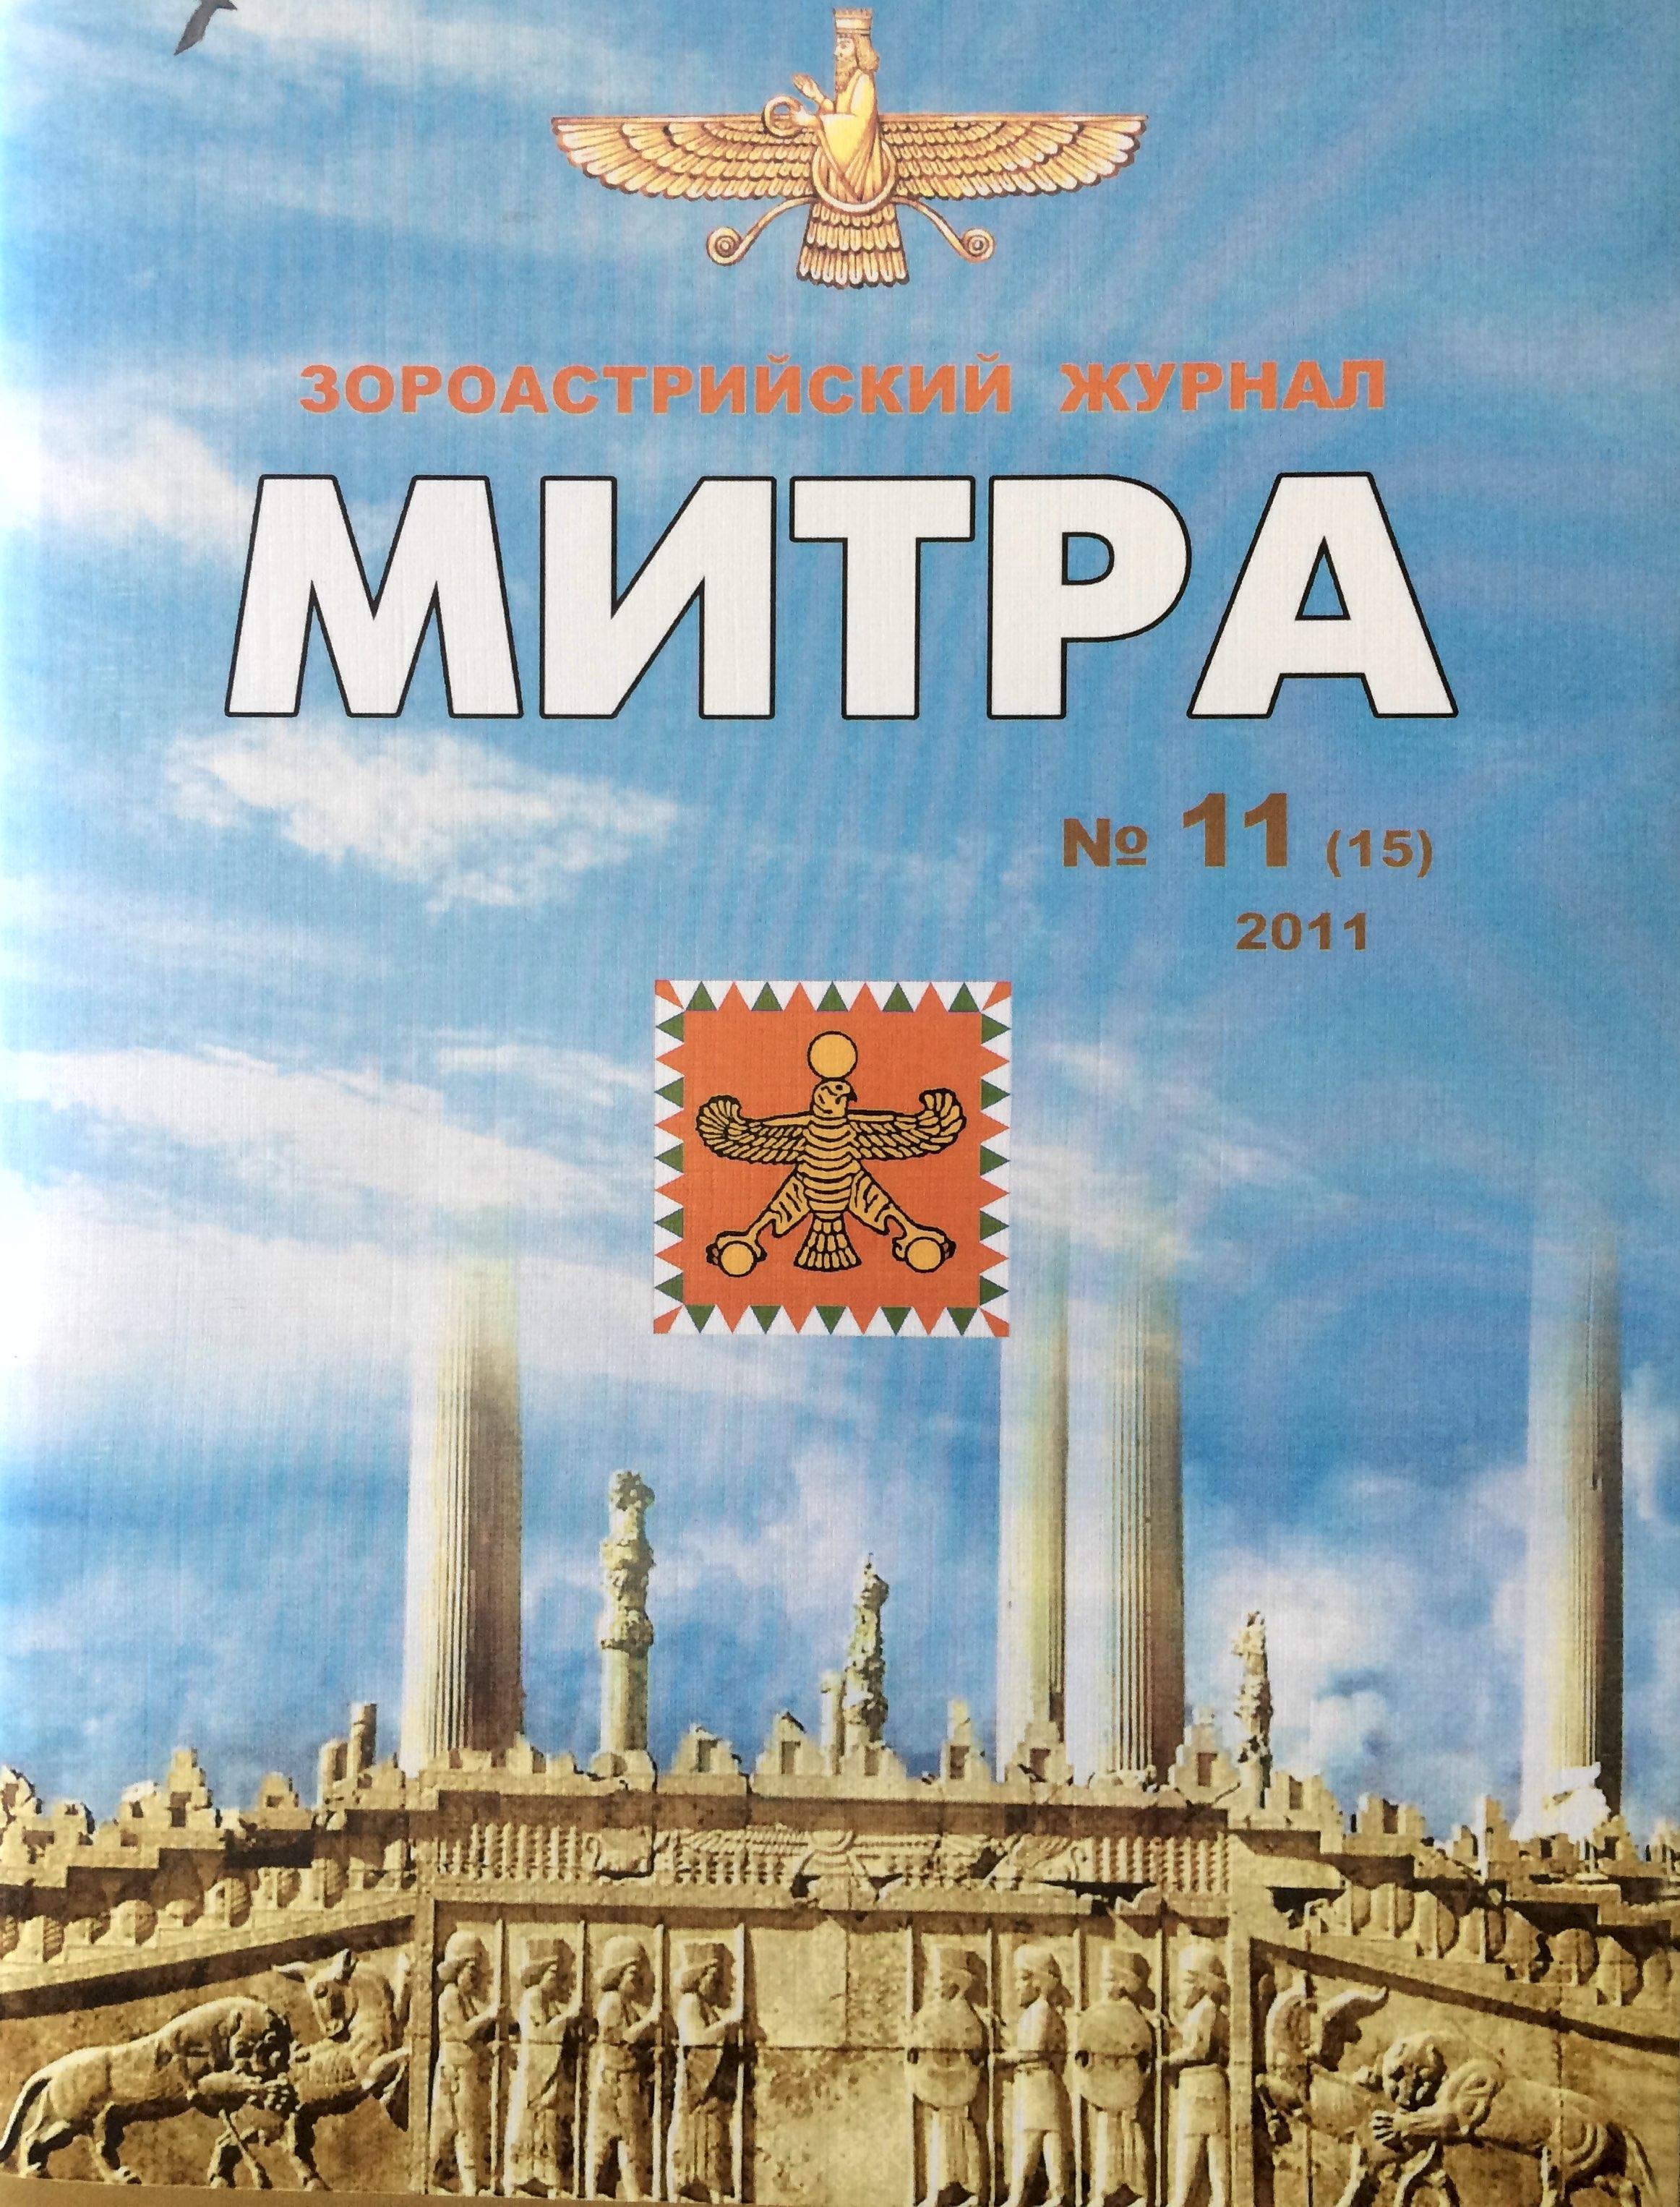 Mitra-11-15-2011